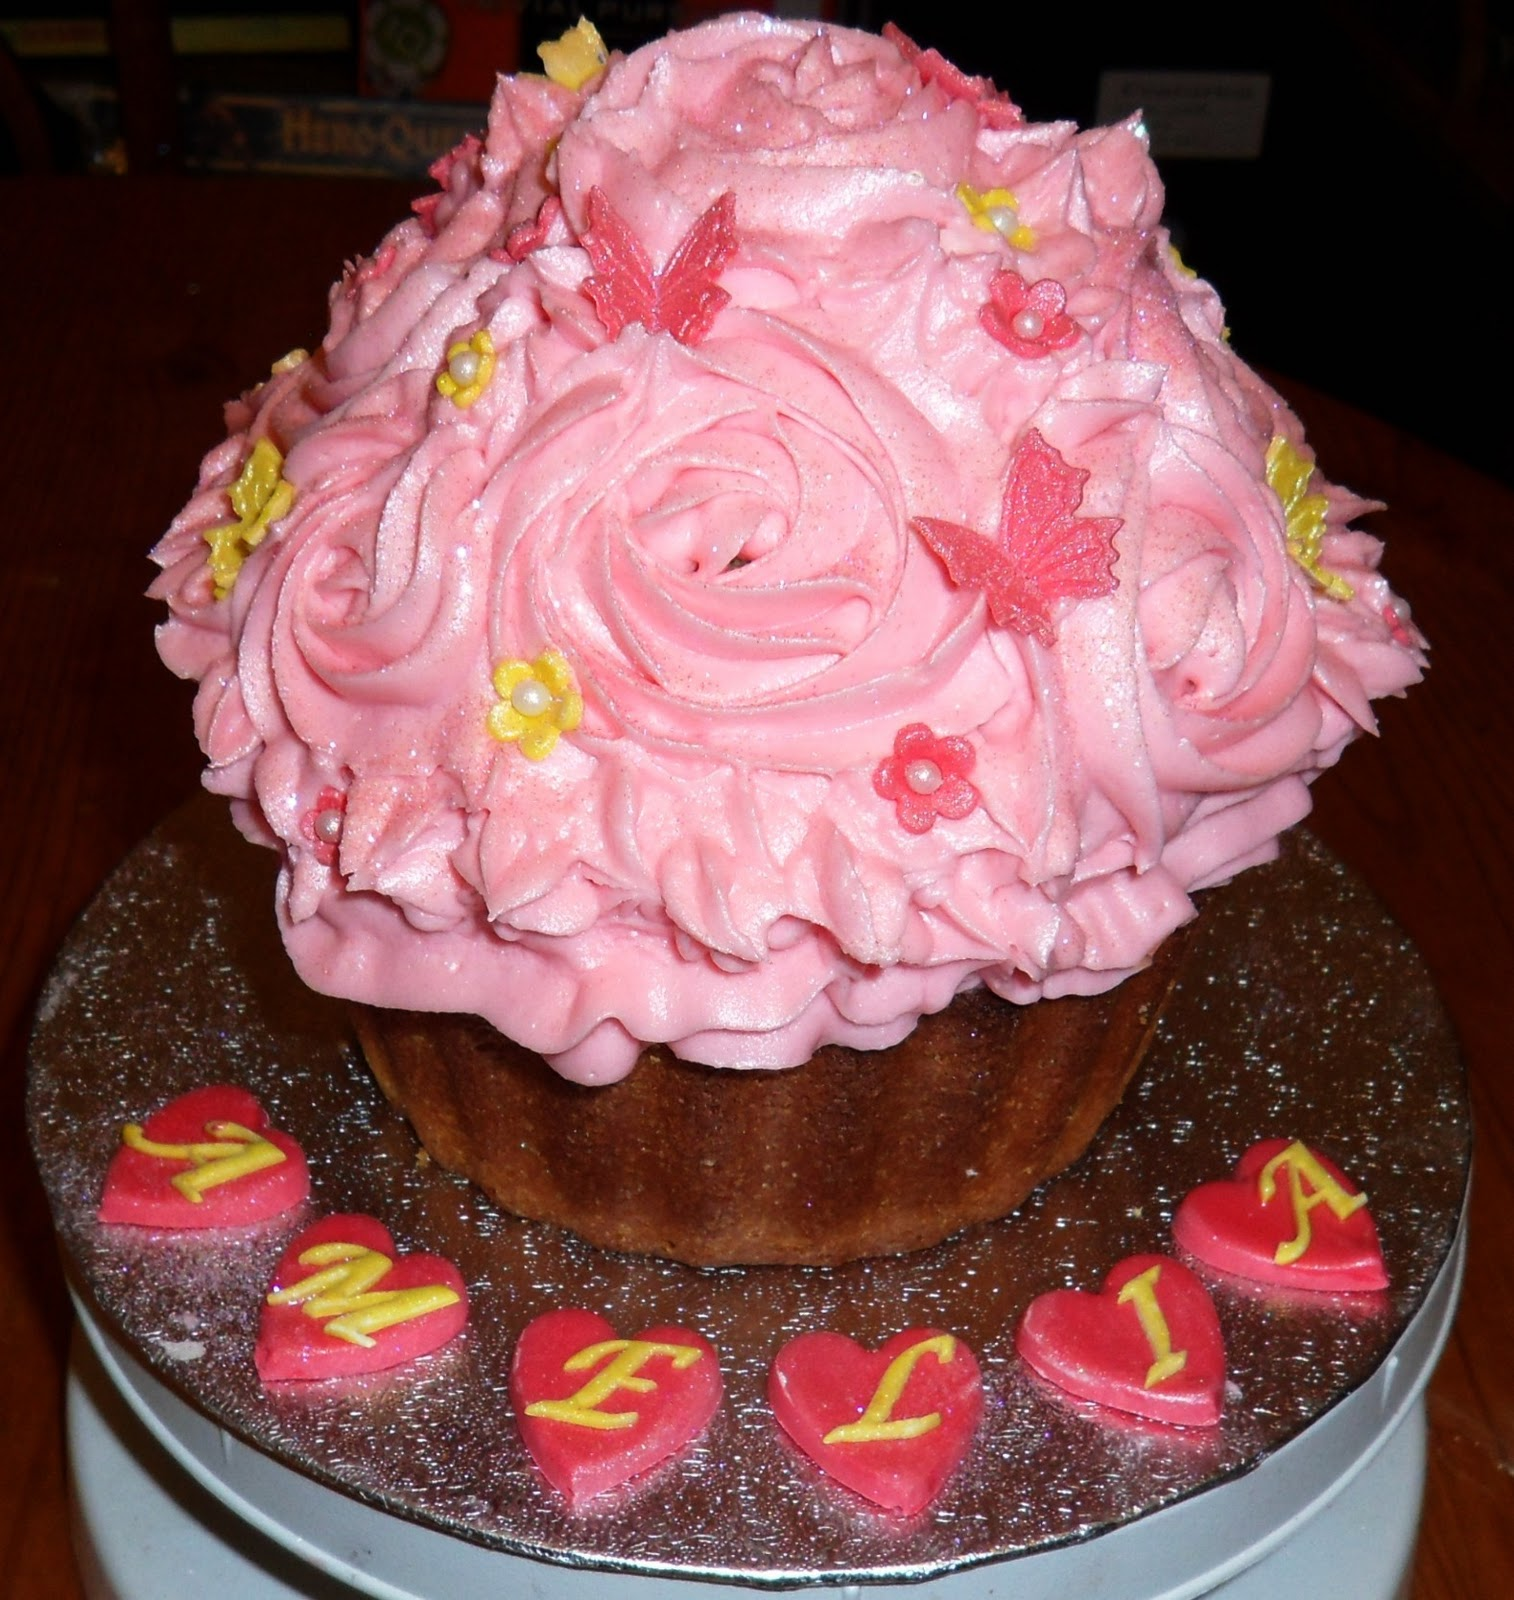 Giant Cupcake Decorating Ideas Birthday : The Fondant Fairy: 20th Birthday Giant Cupcake